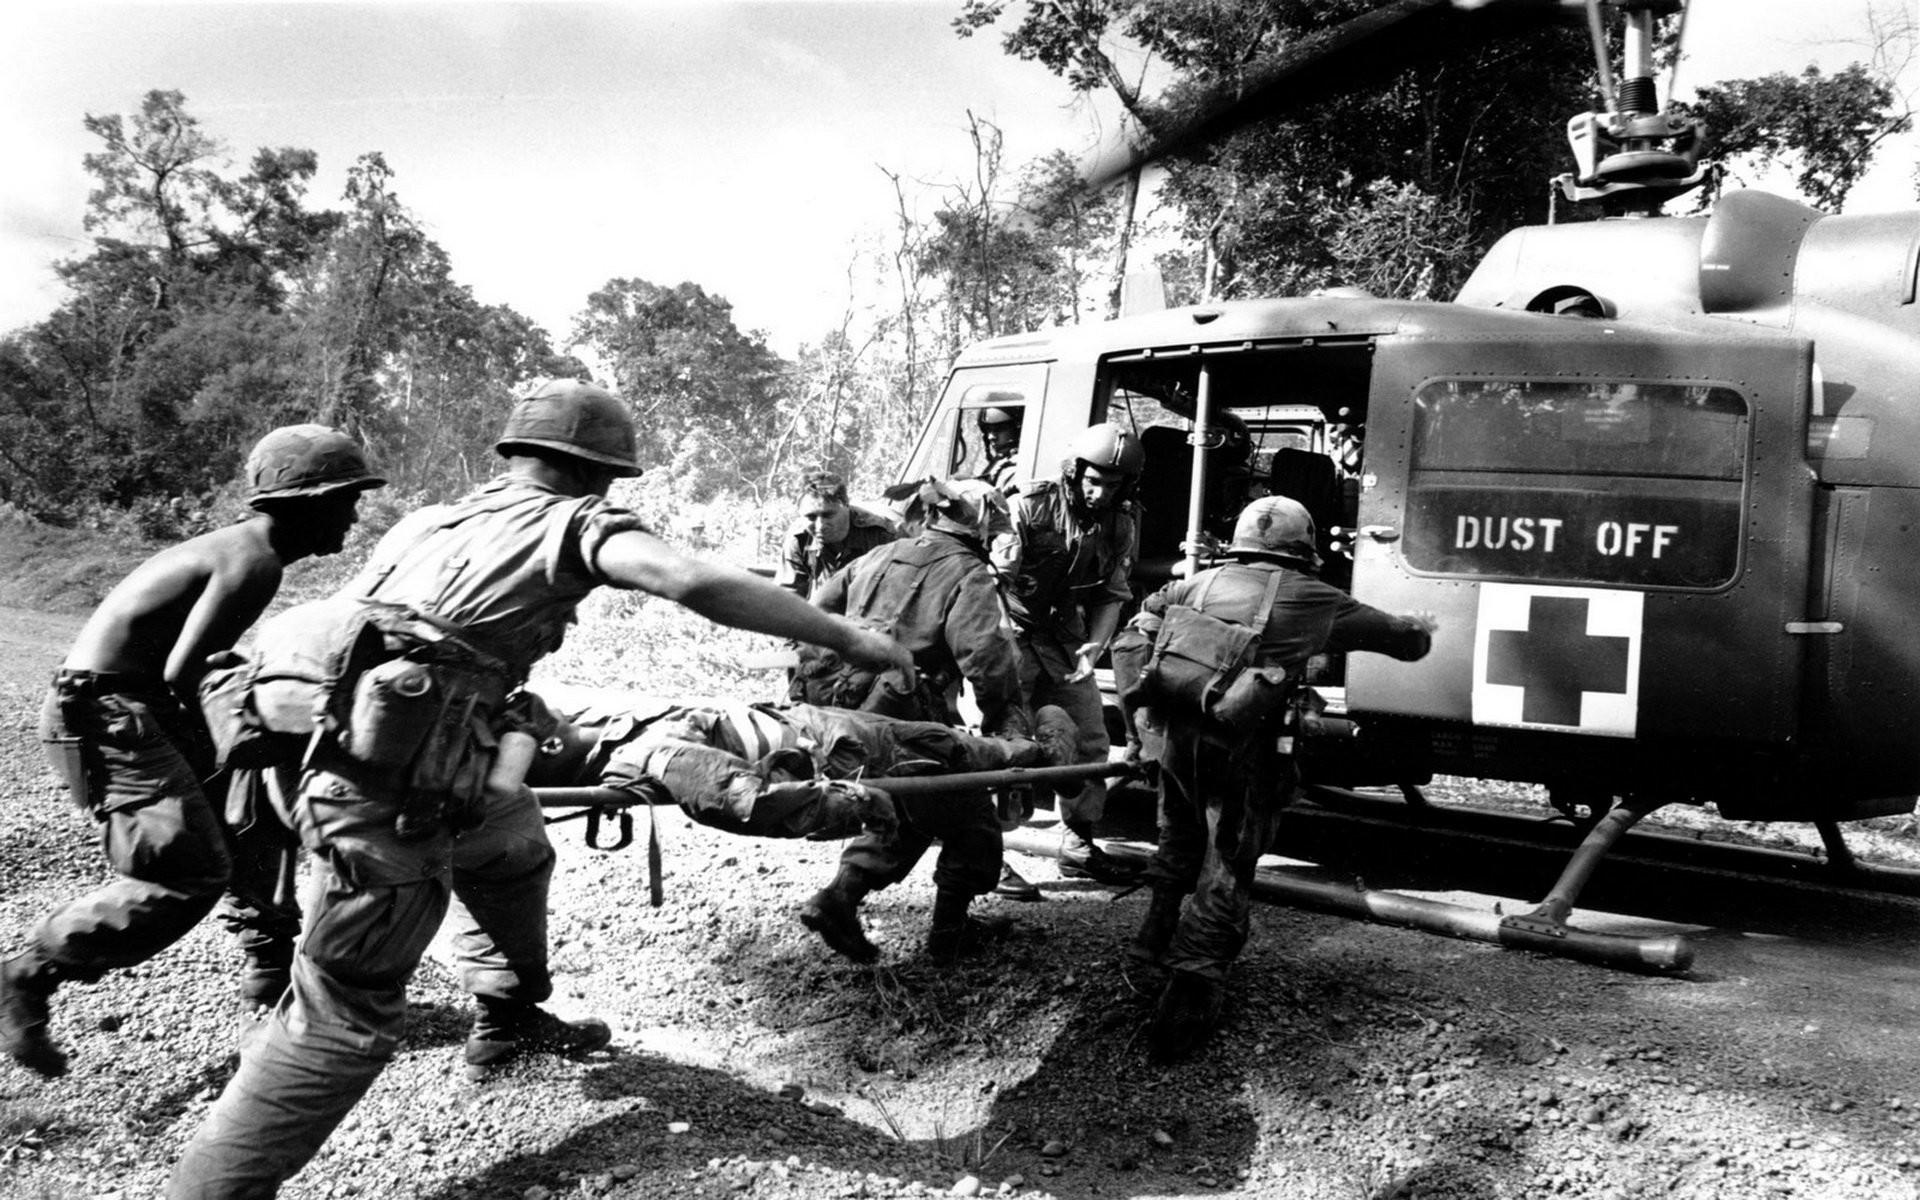 Res: 1920x1200, huey helicopter vietnam war